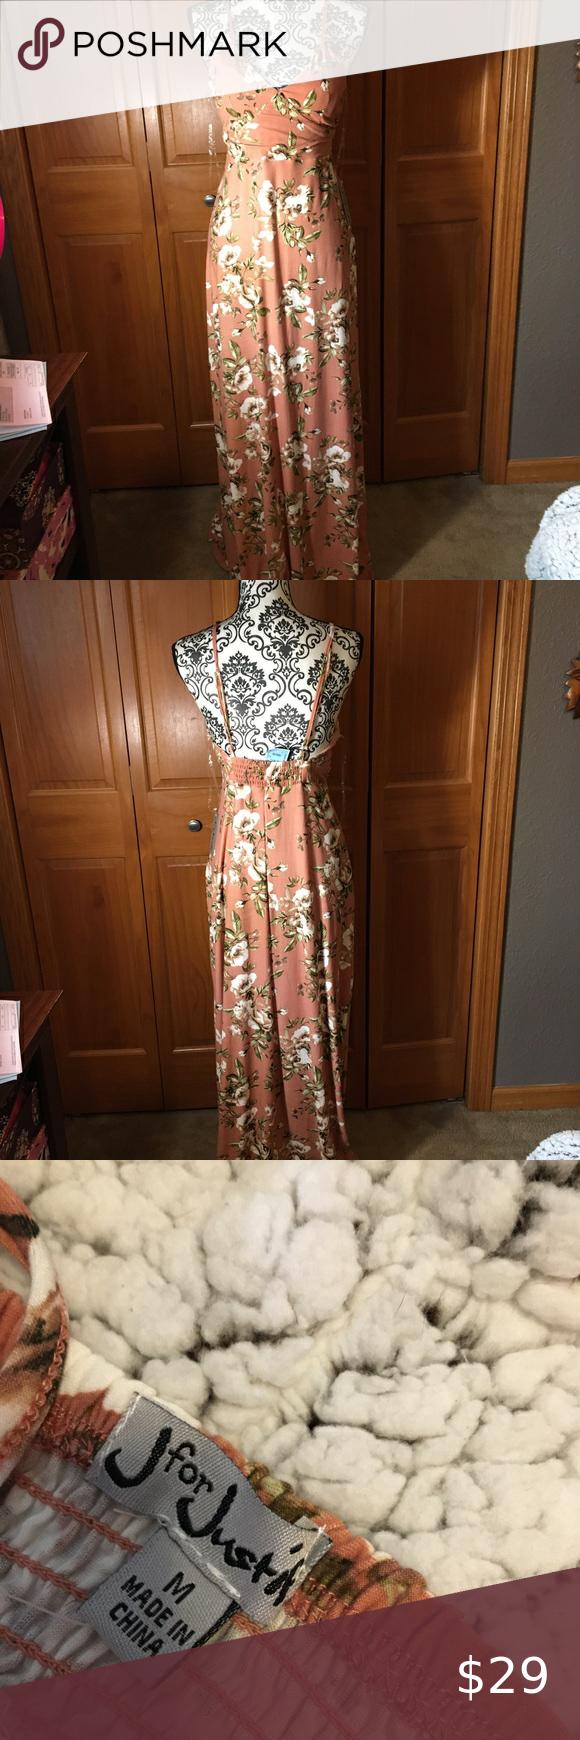 Maxi Floral Summer Dress Floral Dress Summer Summer Dresses Floral [ 1740 x 580 Pixel ]